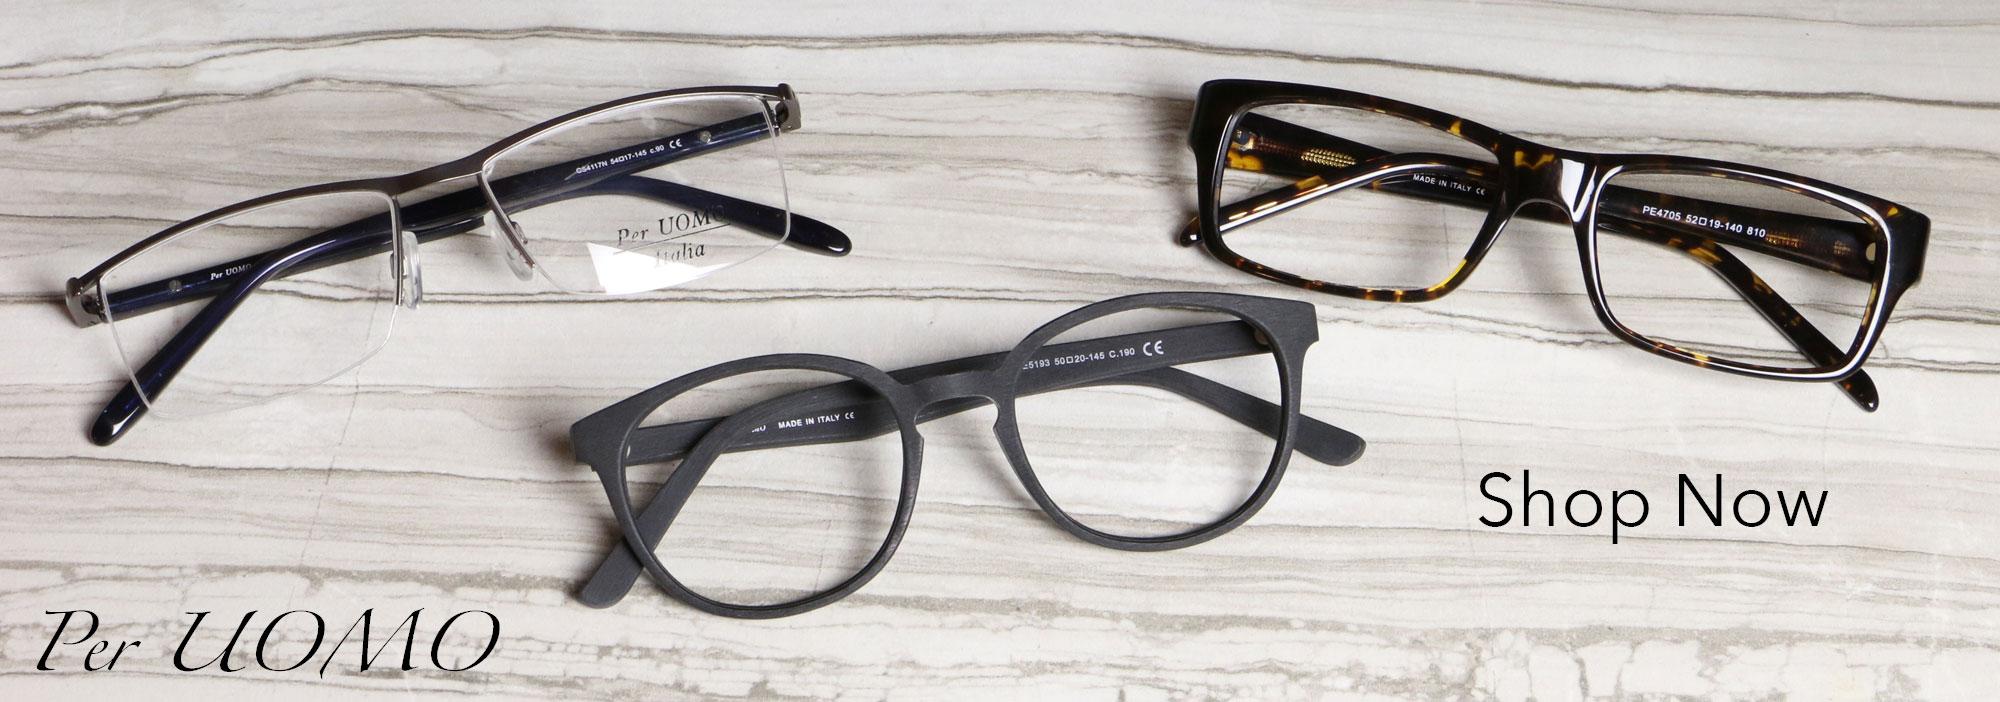 optical glasses online wi5s  Eyewear4less is a b2b online eyewear site that wholesales name brand  eyeglasses & sunglasses